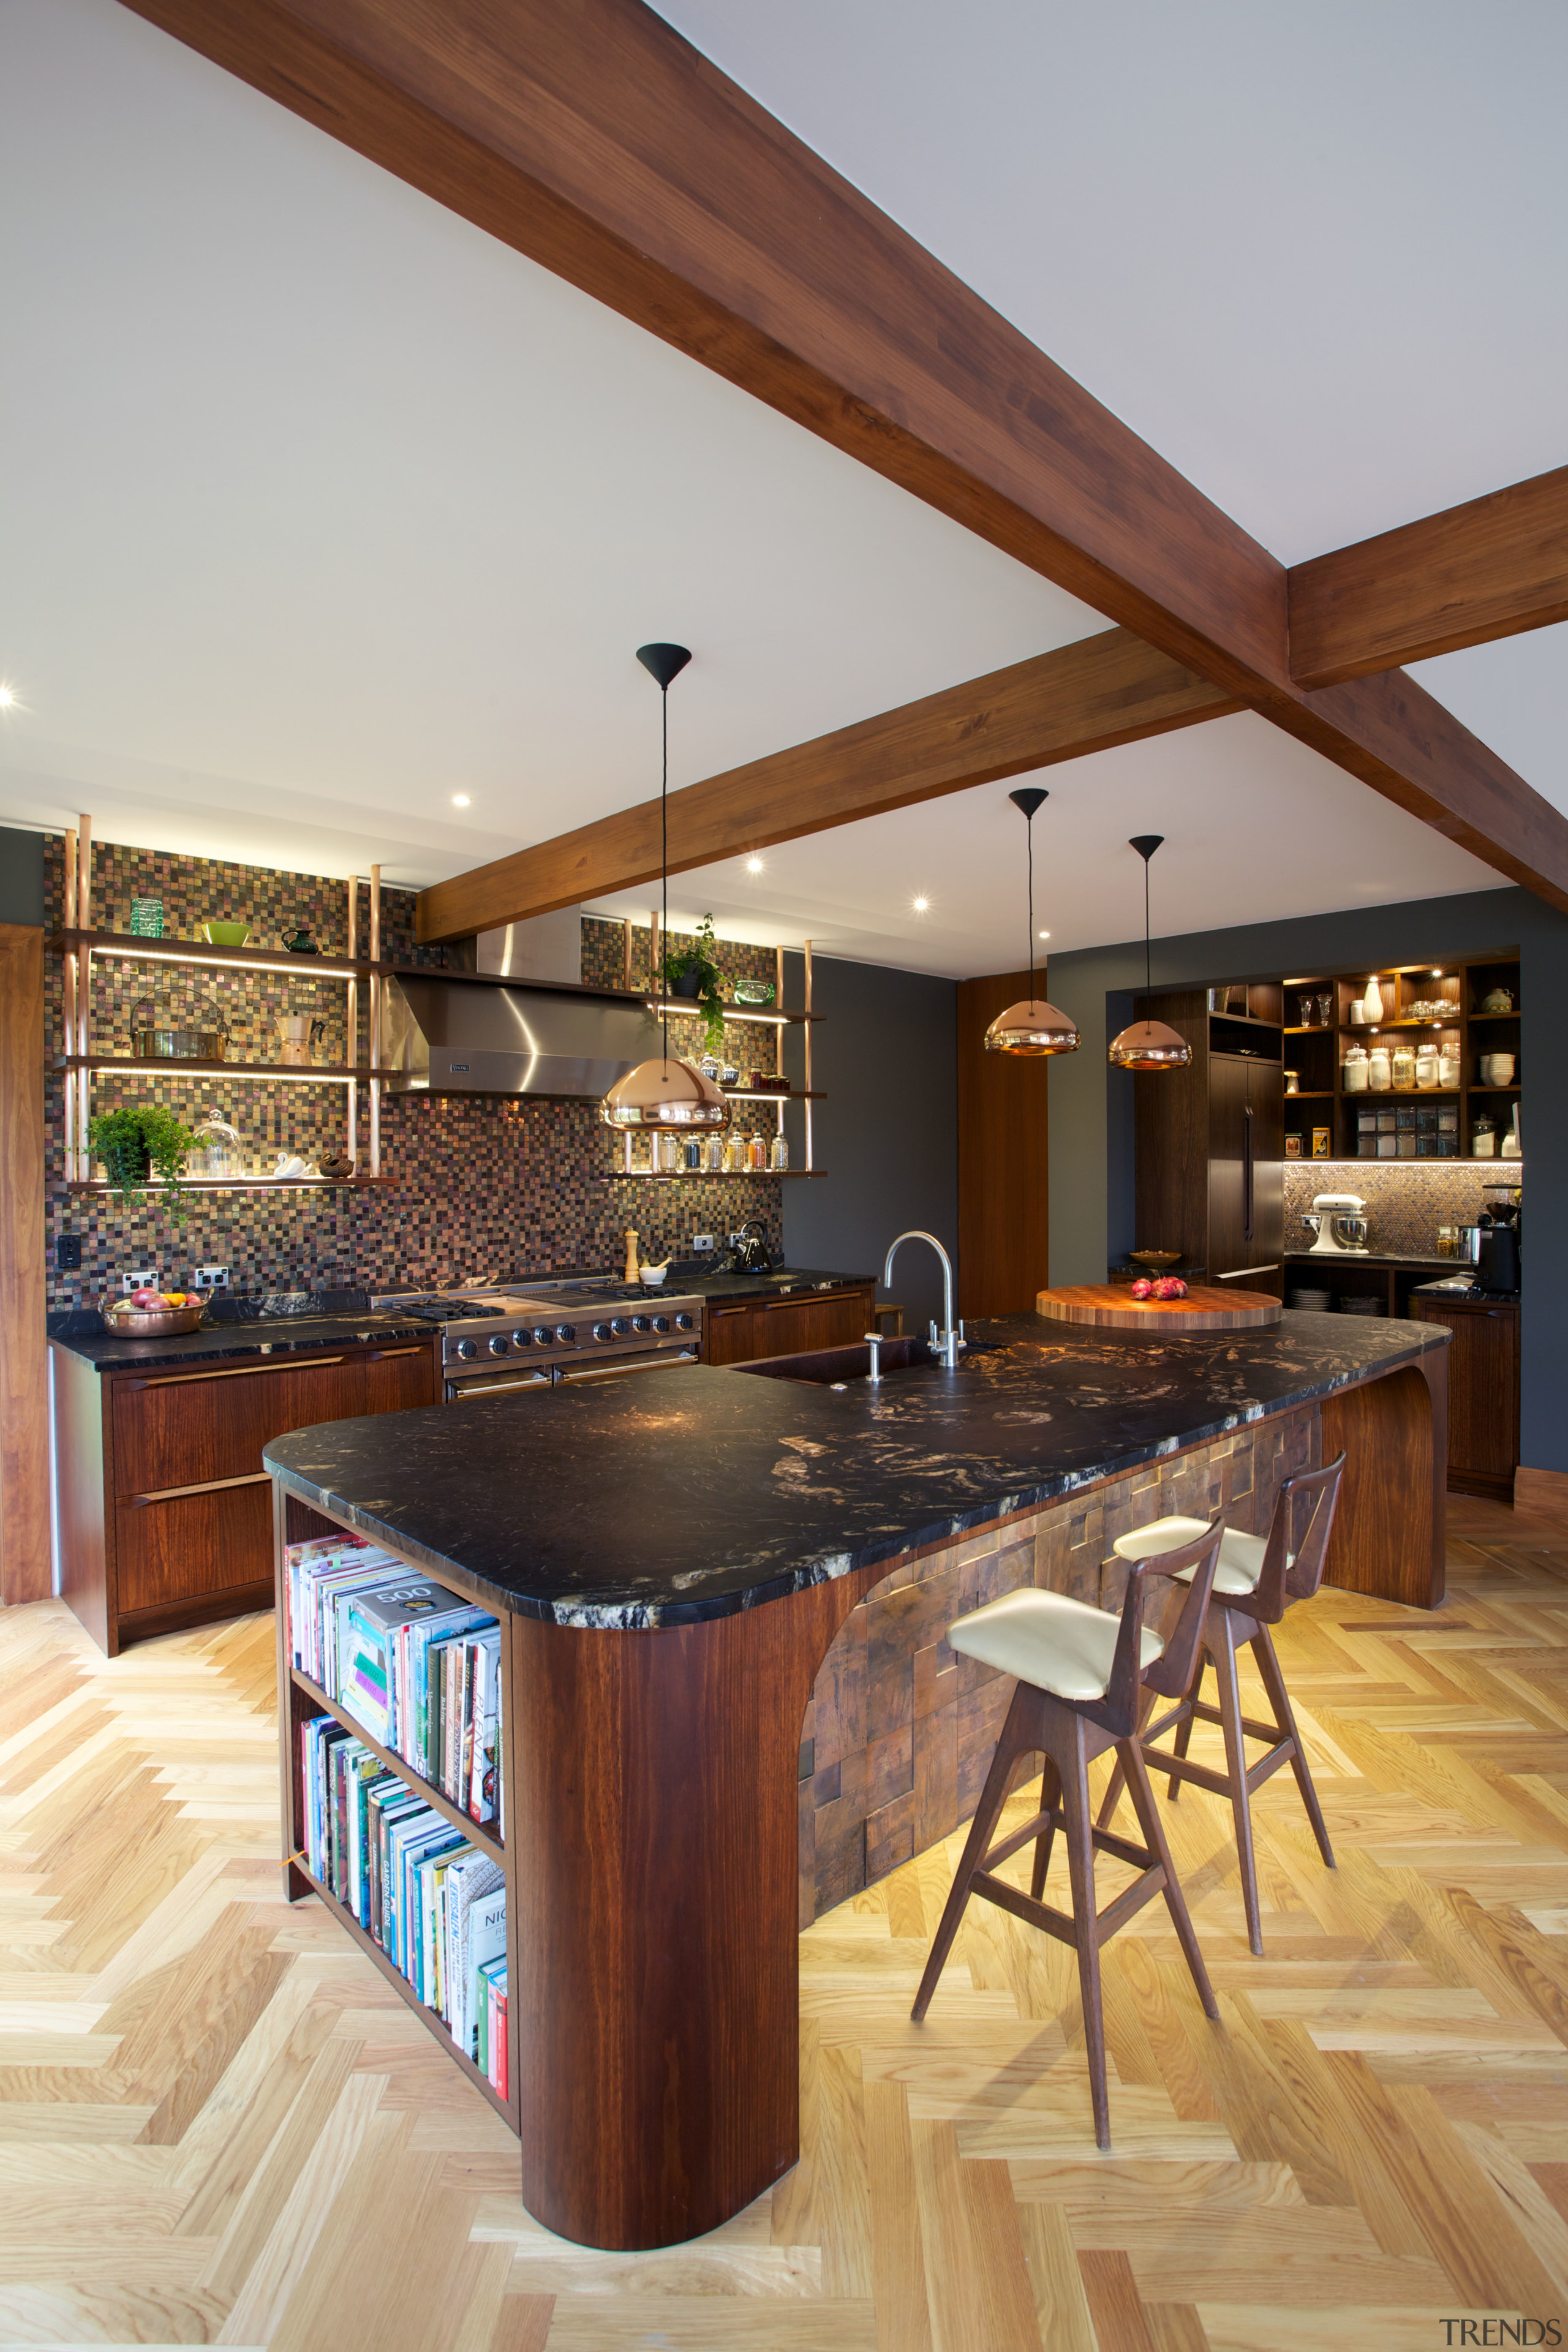 Kitchen in Desert Modern style with copper tiles, countertop, cuisine classique, hardwood, interior design, kitchen, real estate, wood, wood flooring, gray, brown